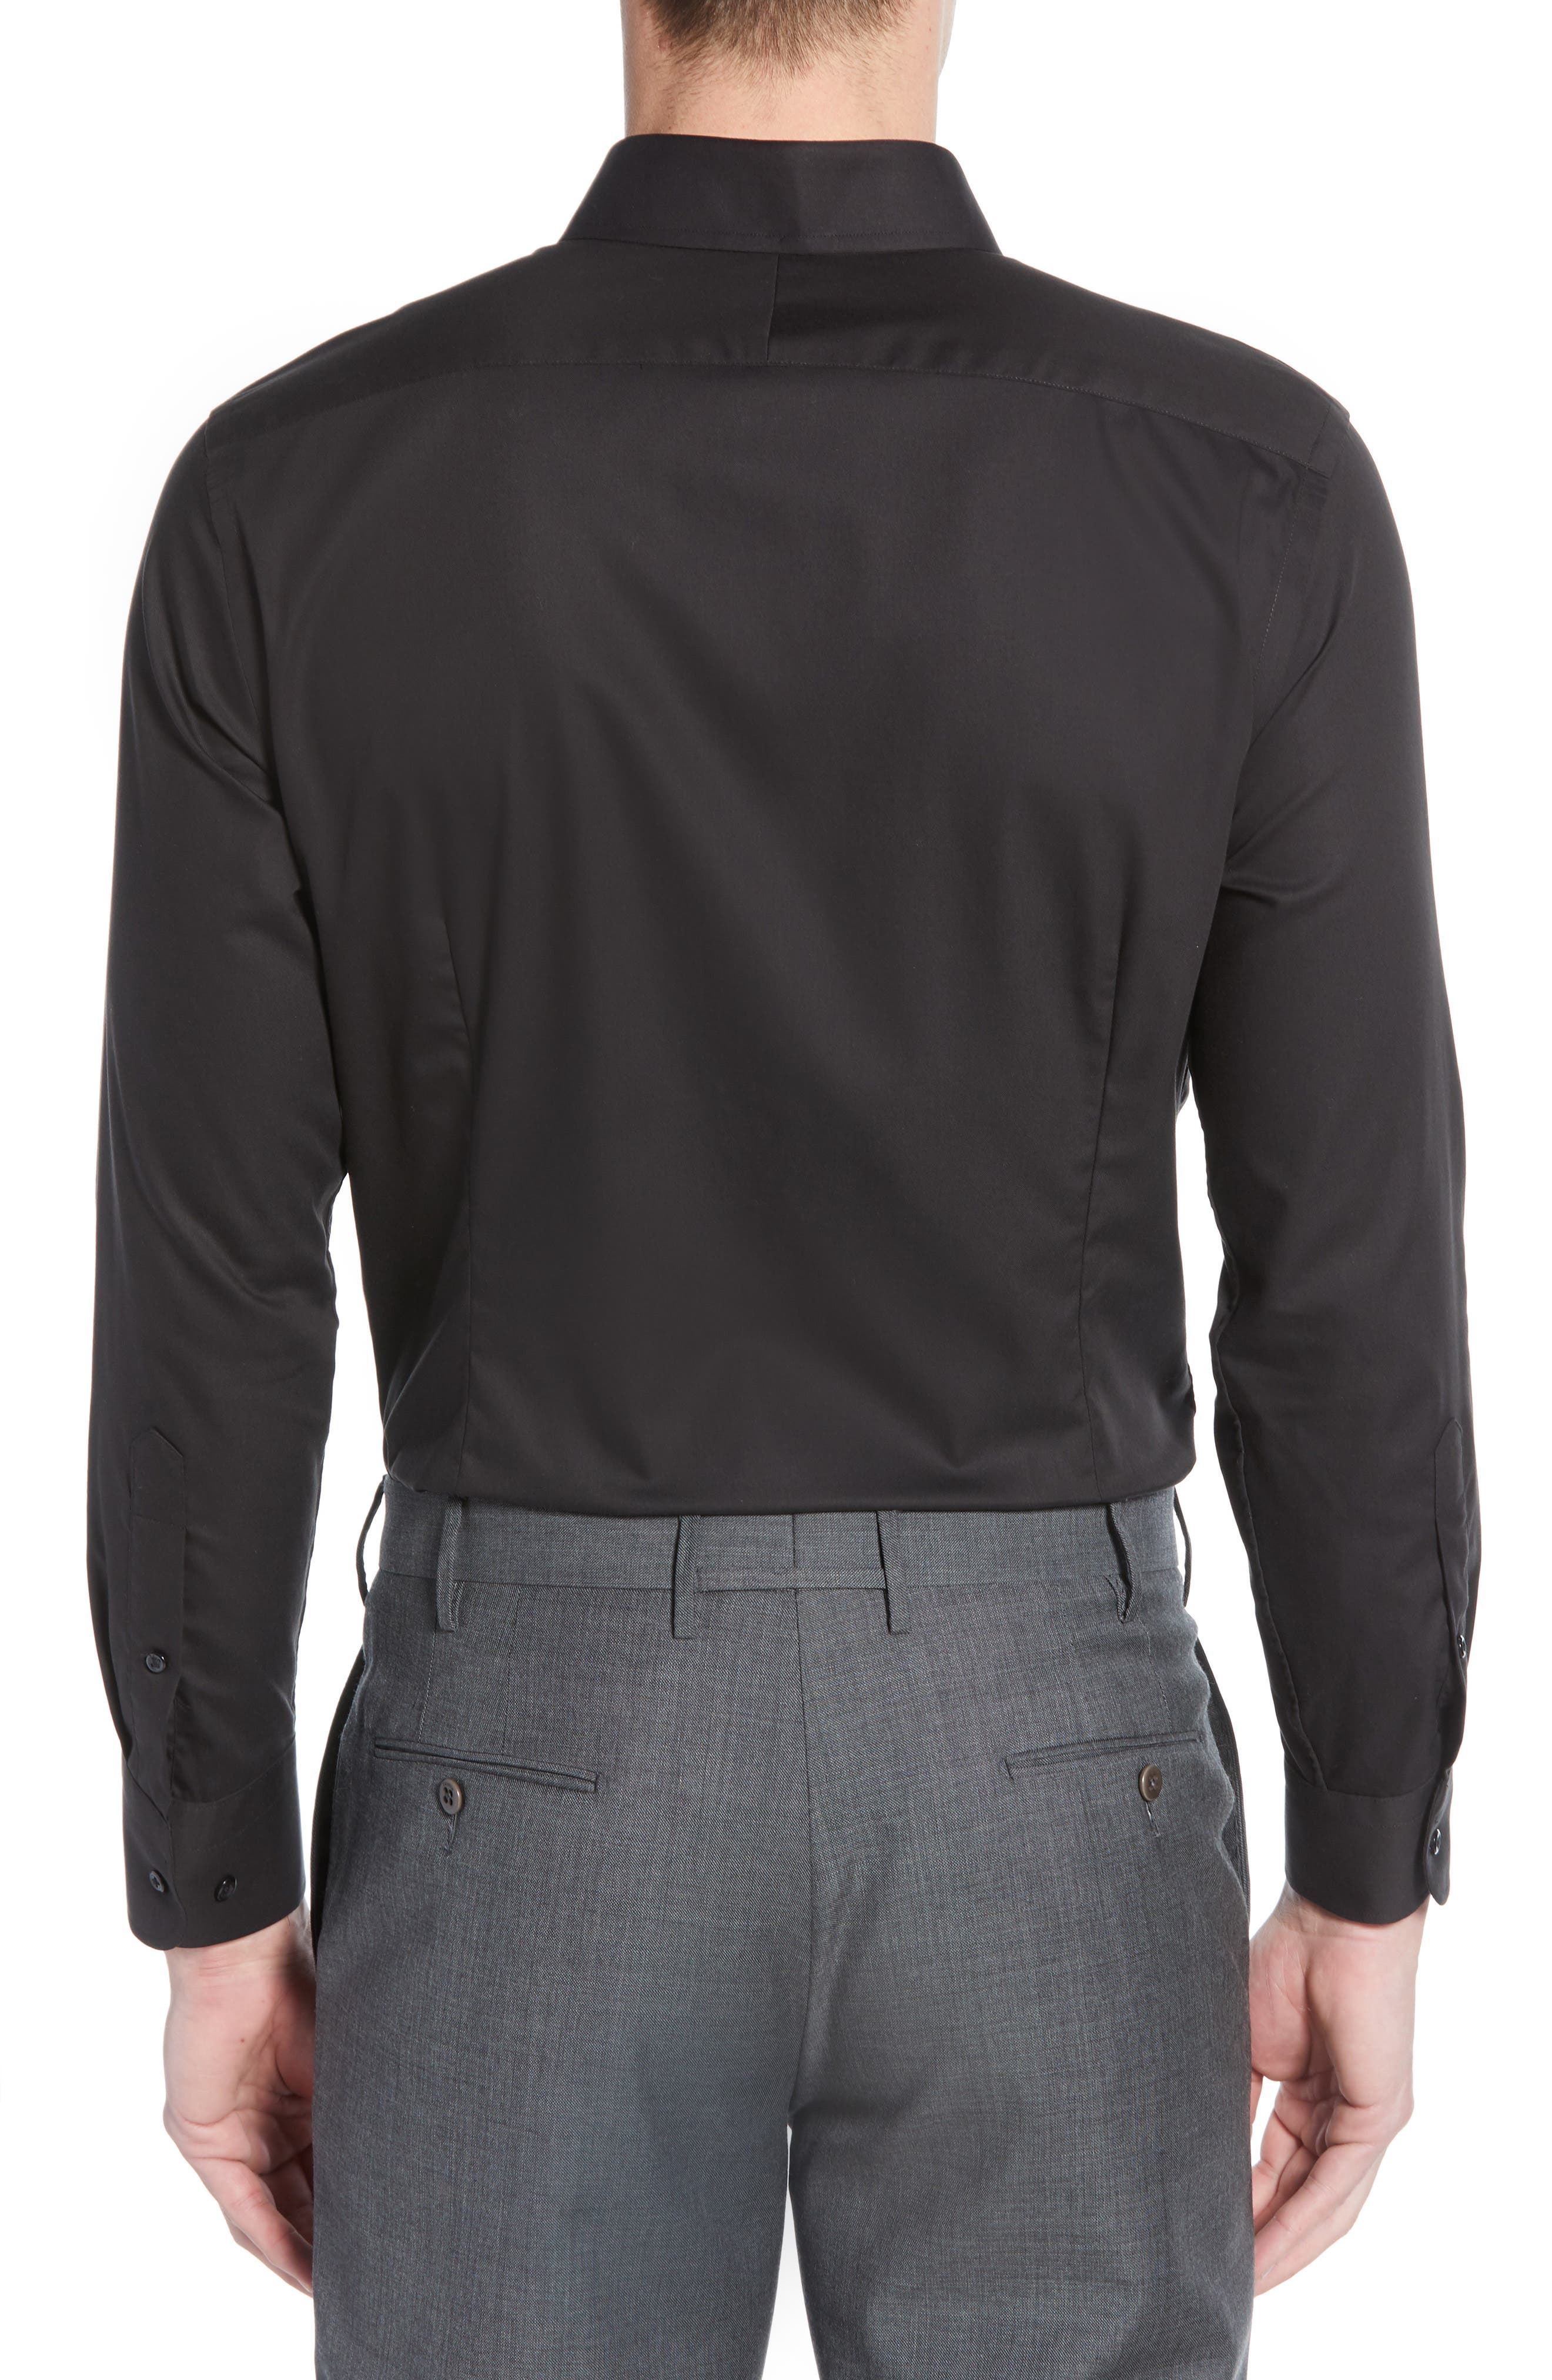 NORDSTROM MEN'S SHOP,                             Extra Trim Fit Non-Iron Solid Dress Shirt,                             Alternate thumbnail 3, color,                             BLACK ROCK